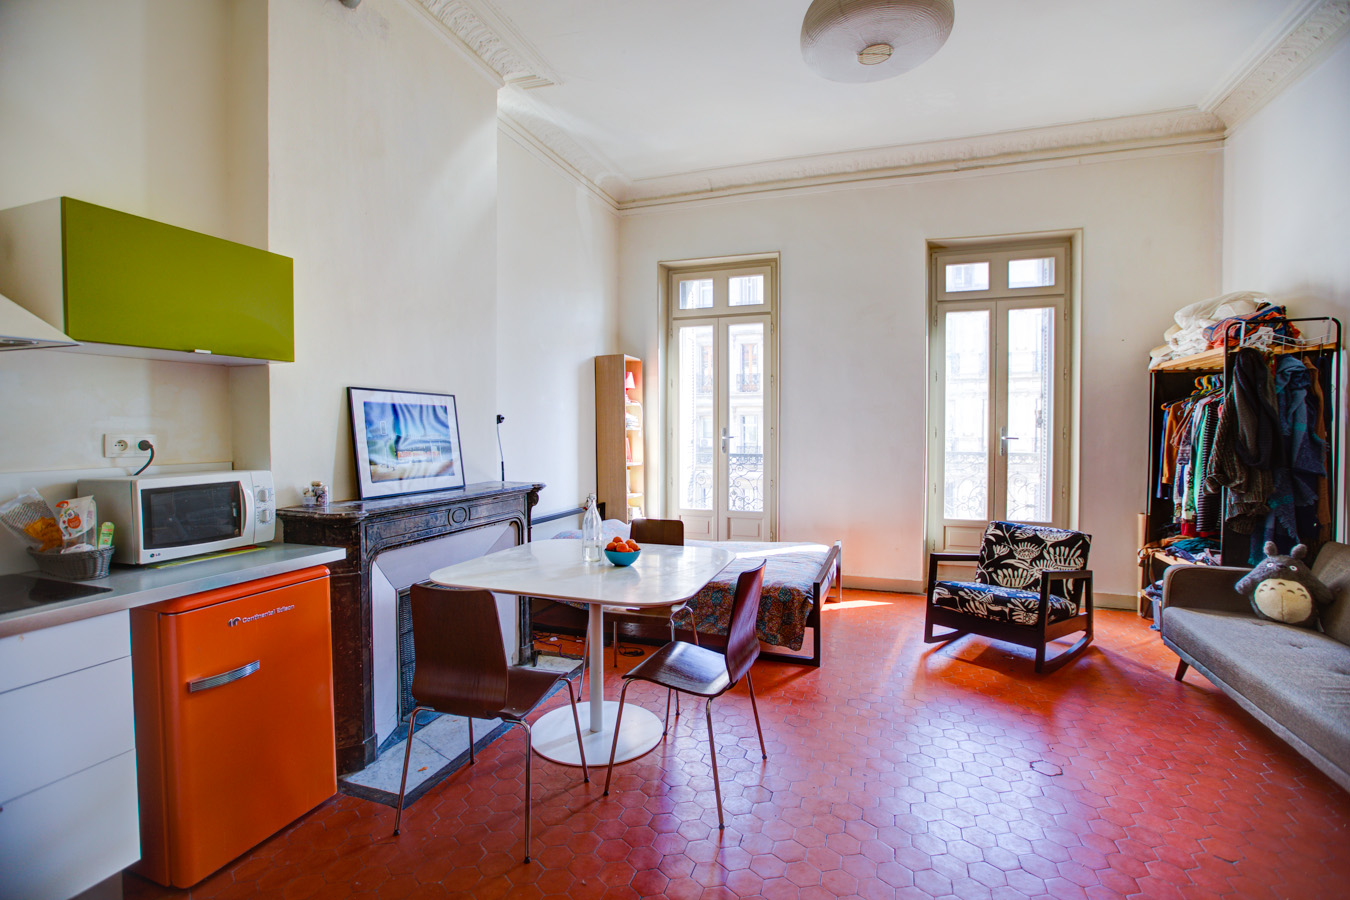 Vendu Marseille 13001 – Saint-Charles – Studio – Grenier – 99 000 €